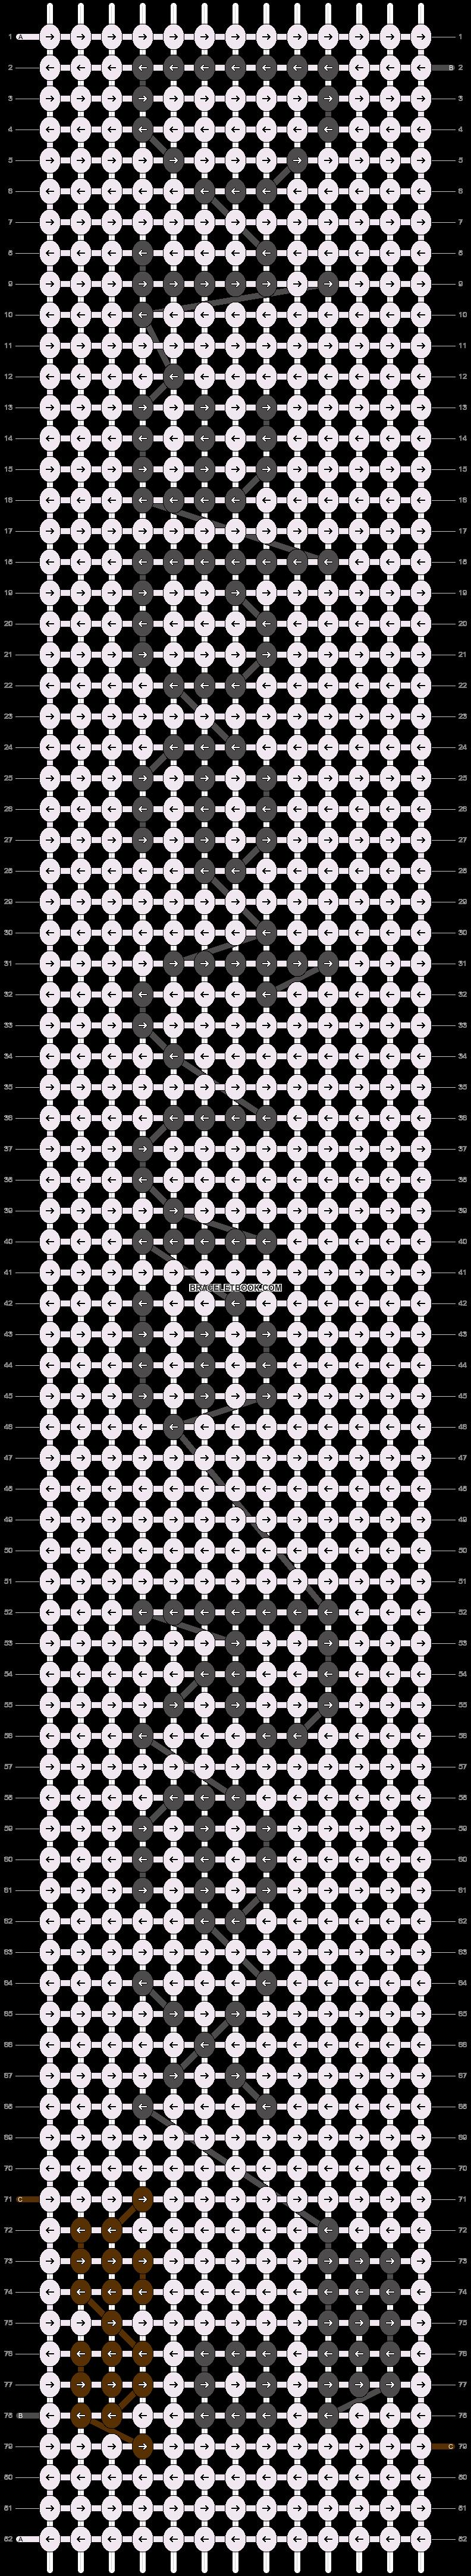 Alpha pattern #20407 pattern